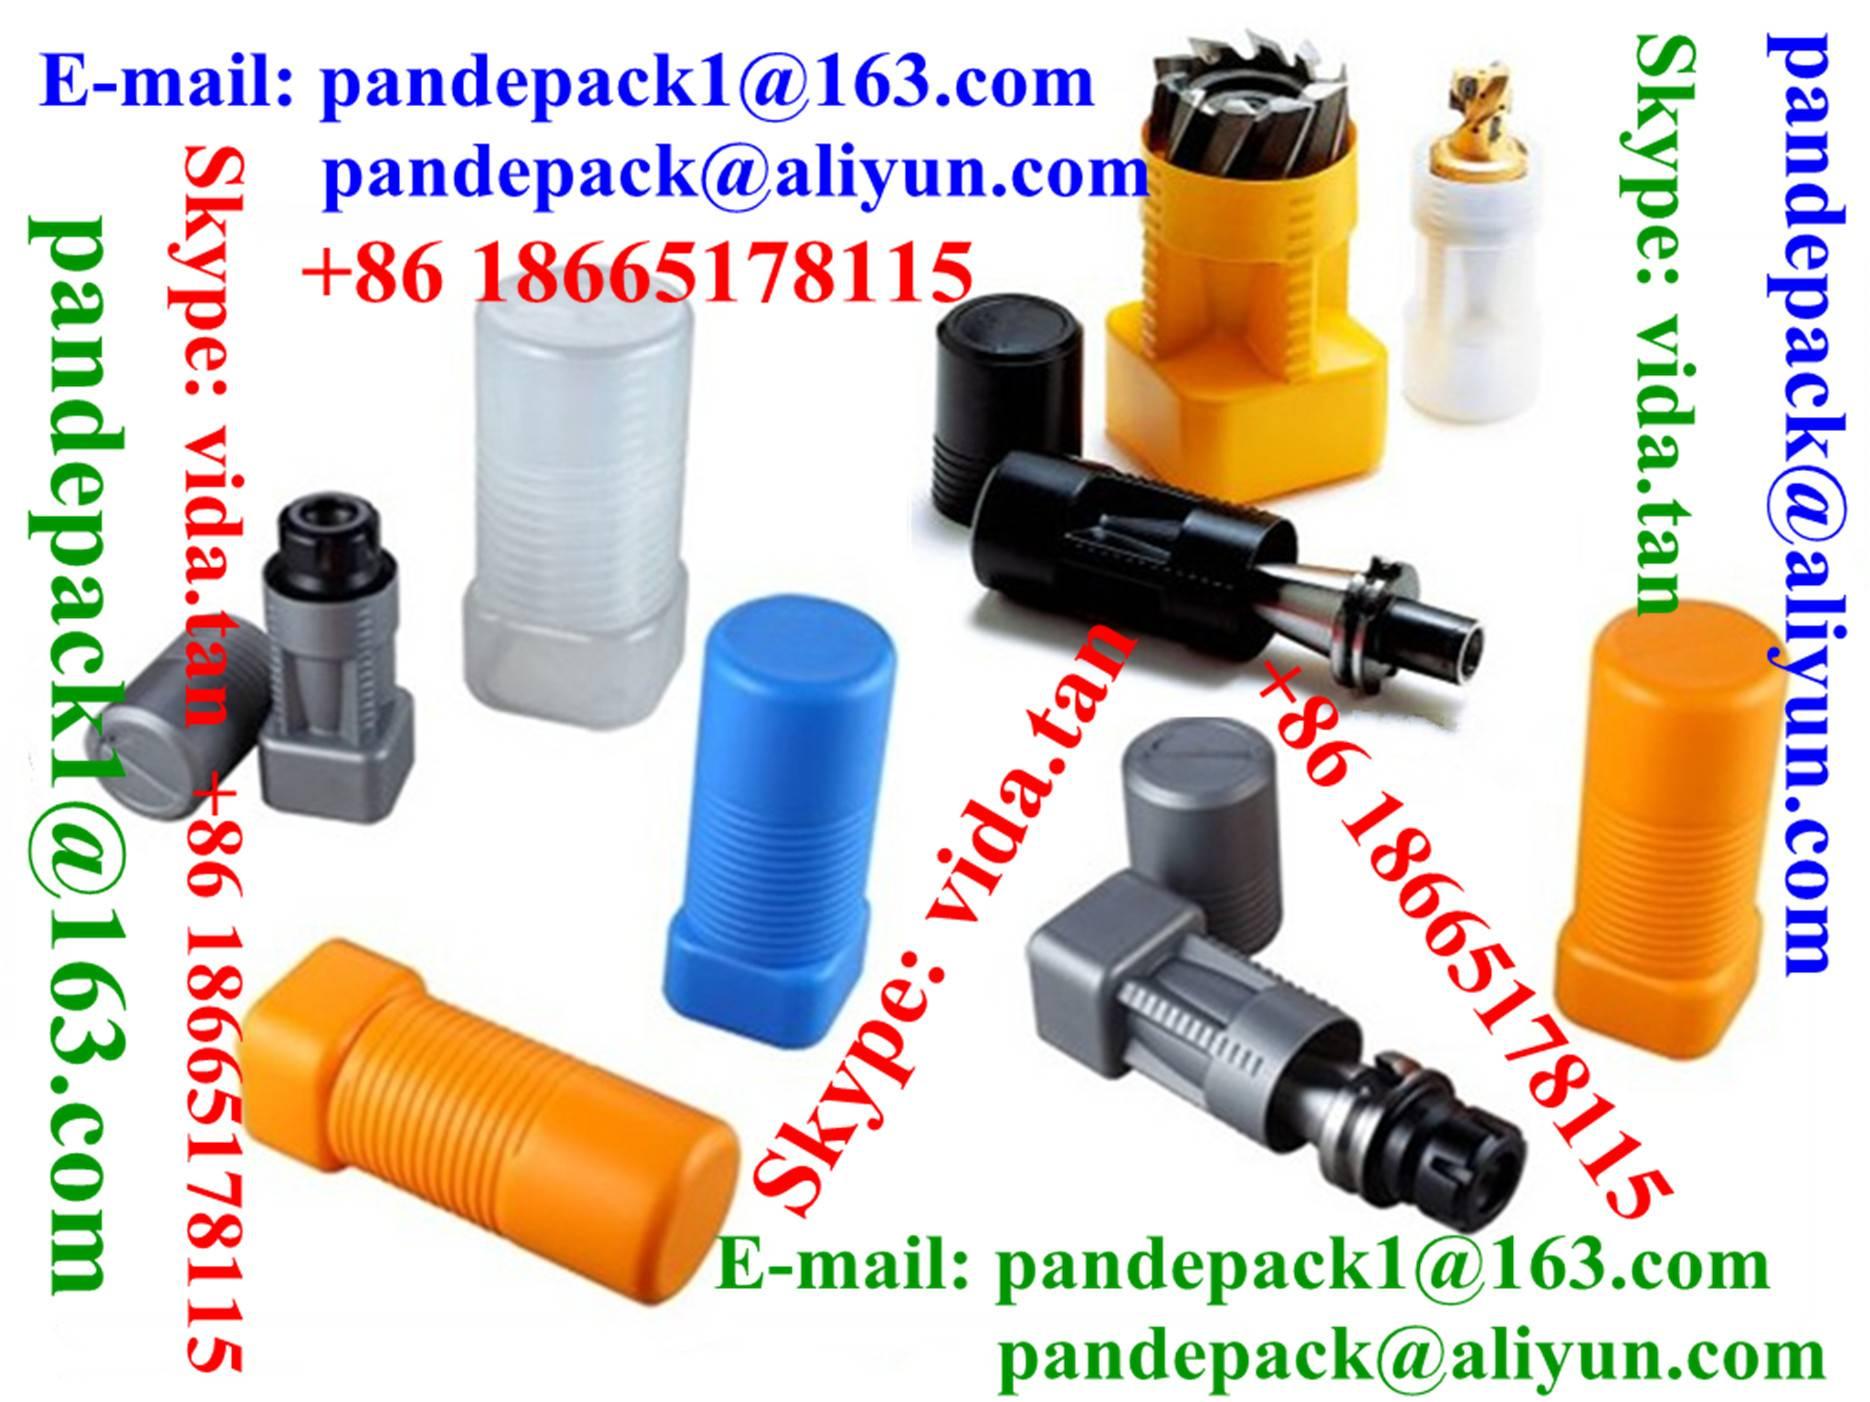 Sell ChuckPack/BT,SK Tool Holder Plastic Box/Package/Pack/CNC Cutting Tool Box/Pack/Package/Parts